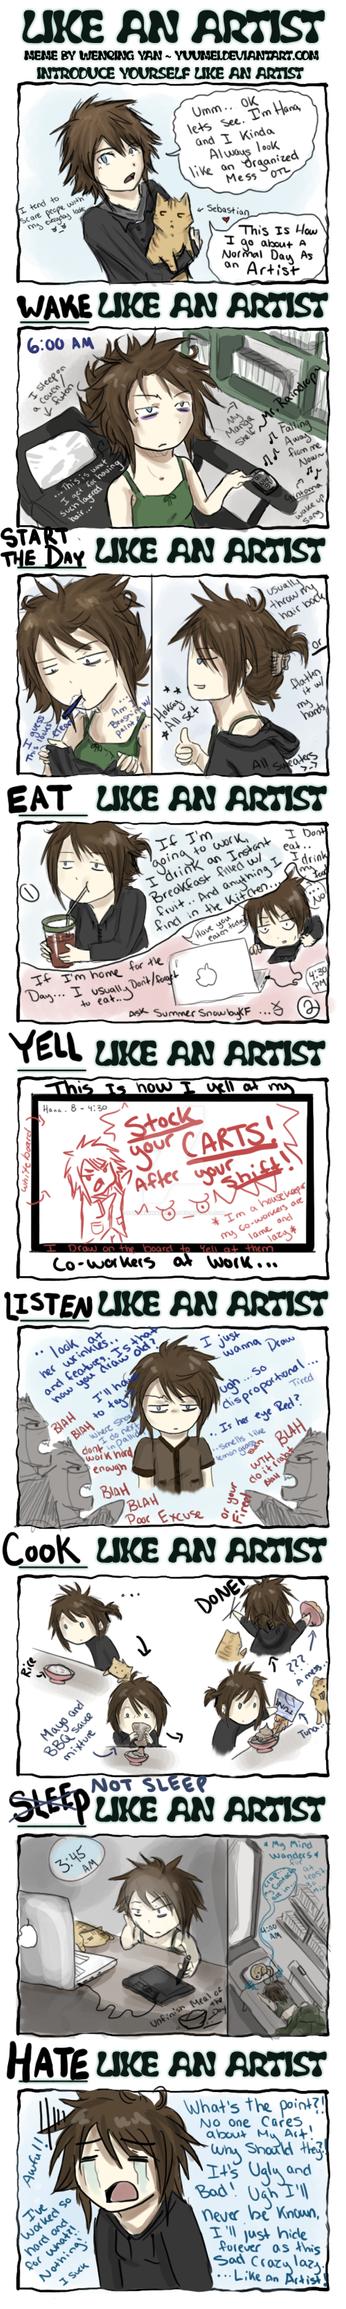 Like an artist Meme by SamuraiWARRIOR7